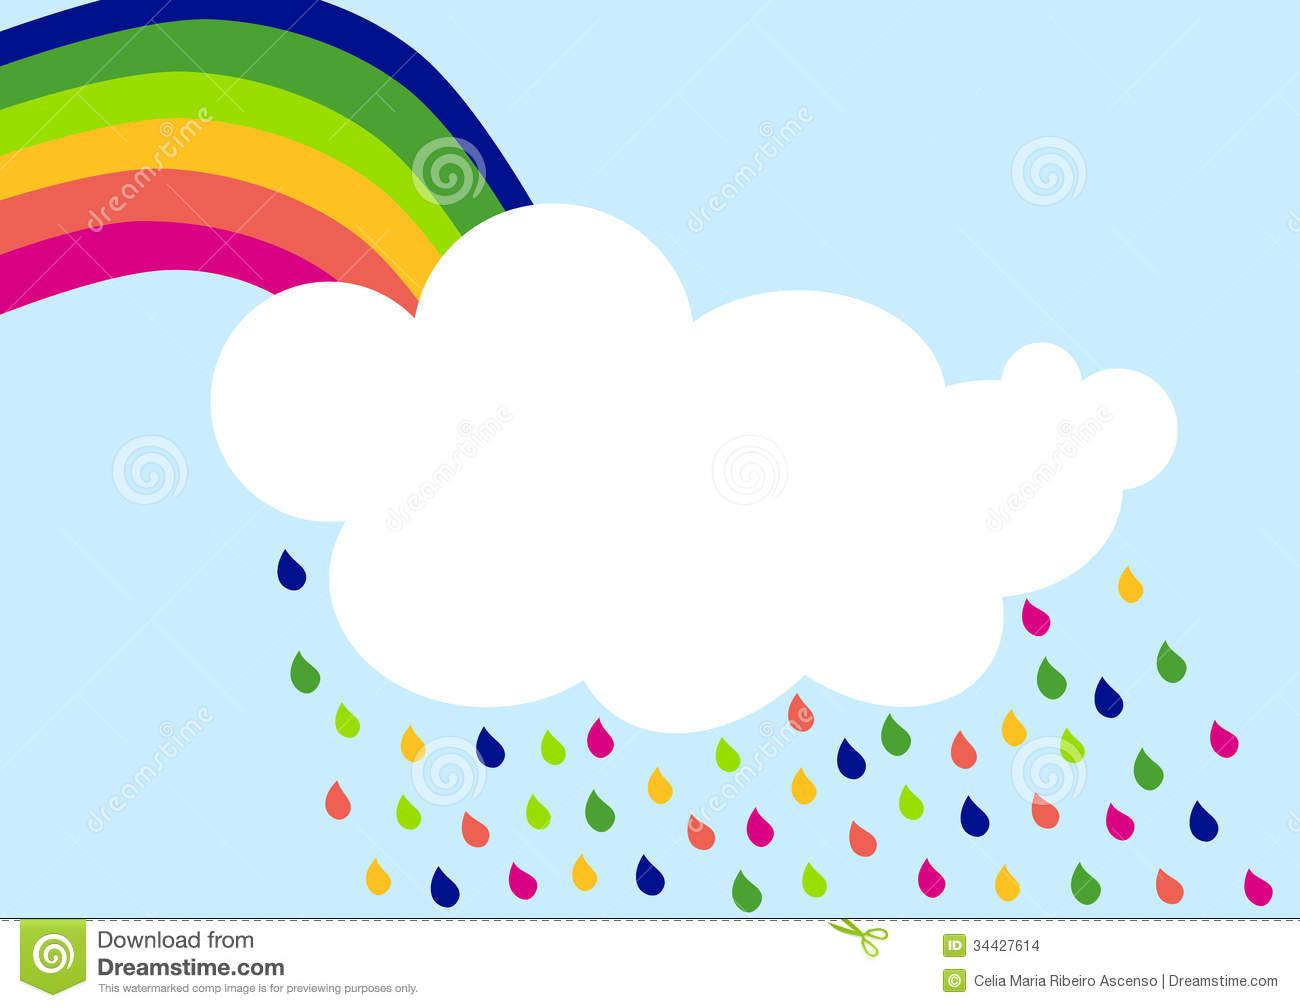 Rainbow Invitation Template Google Search Rainbow Party